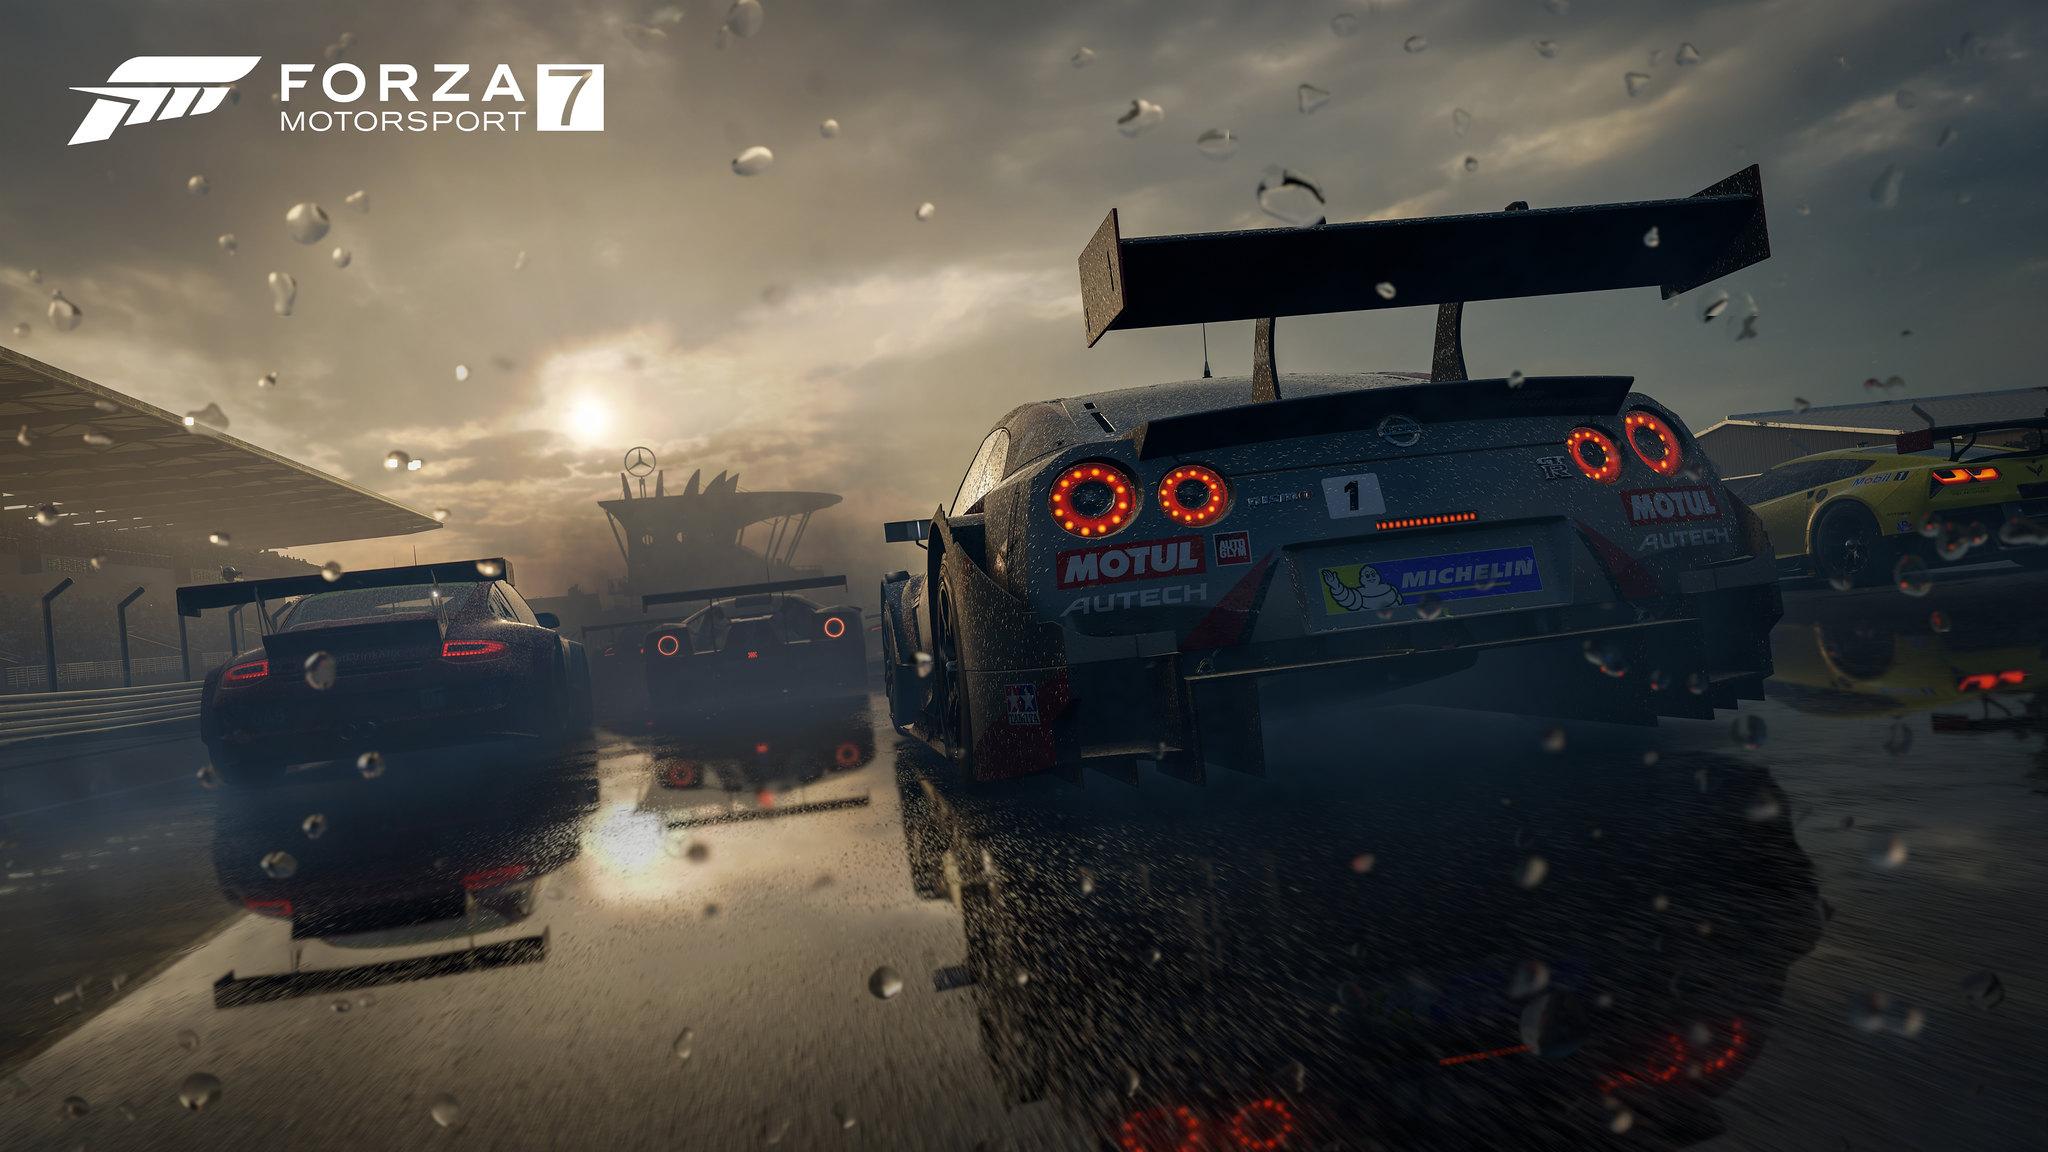 Forza7_E3_PressKit_03_OtherSideOfTheStorm_WM_4K